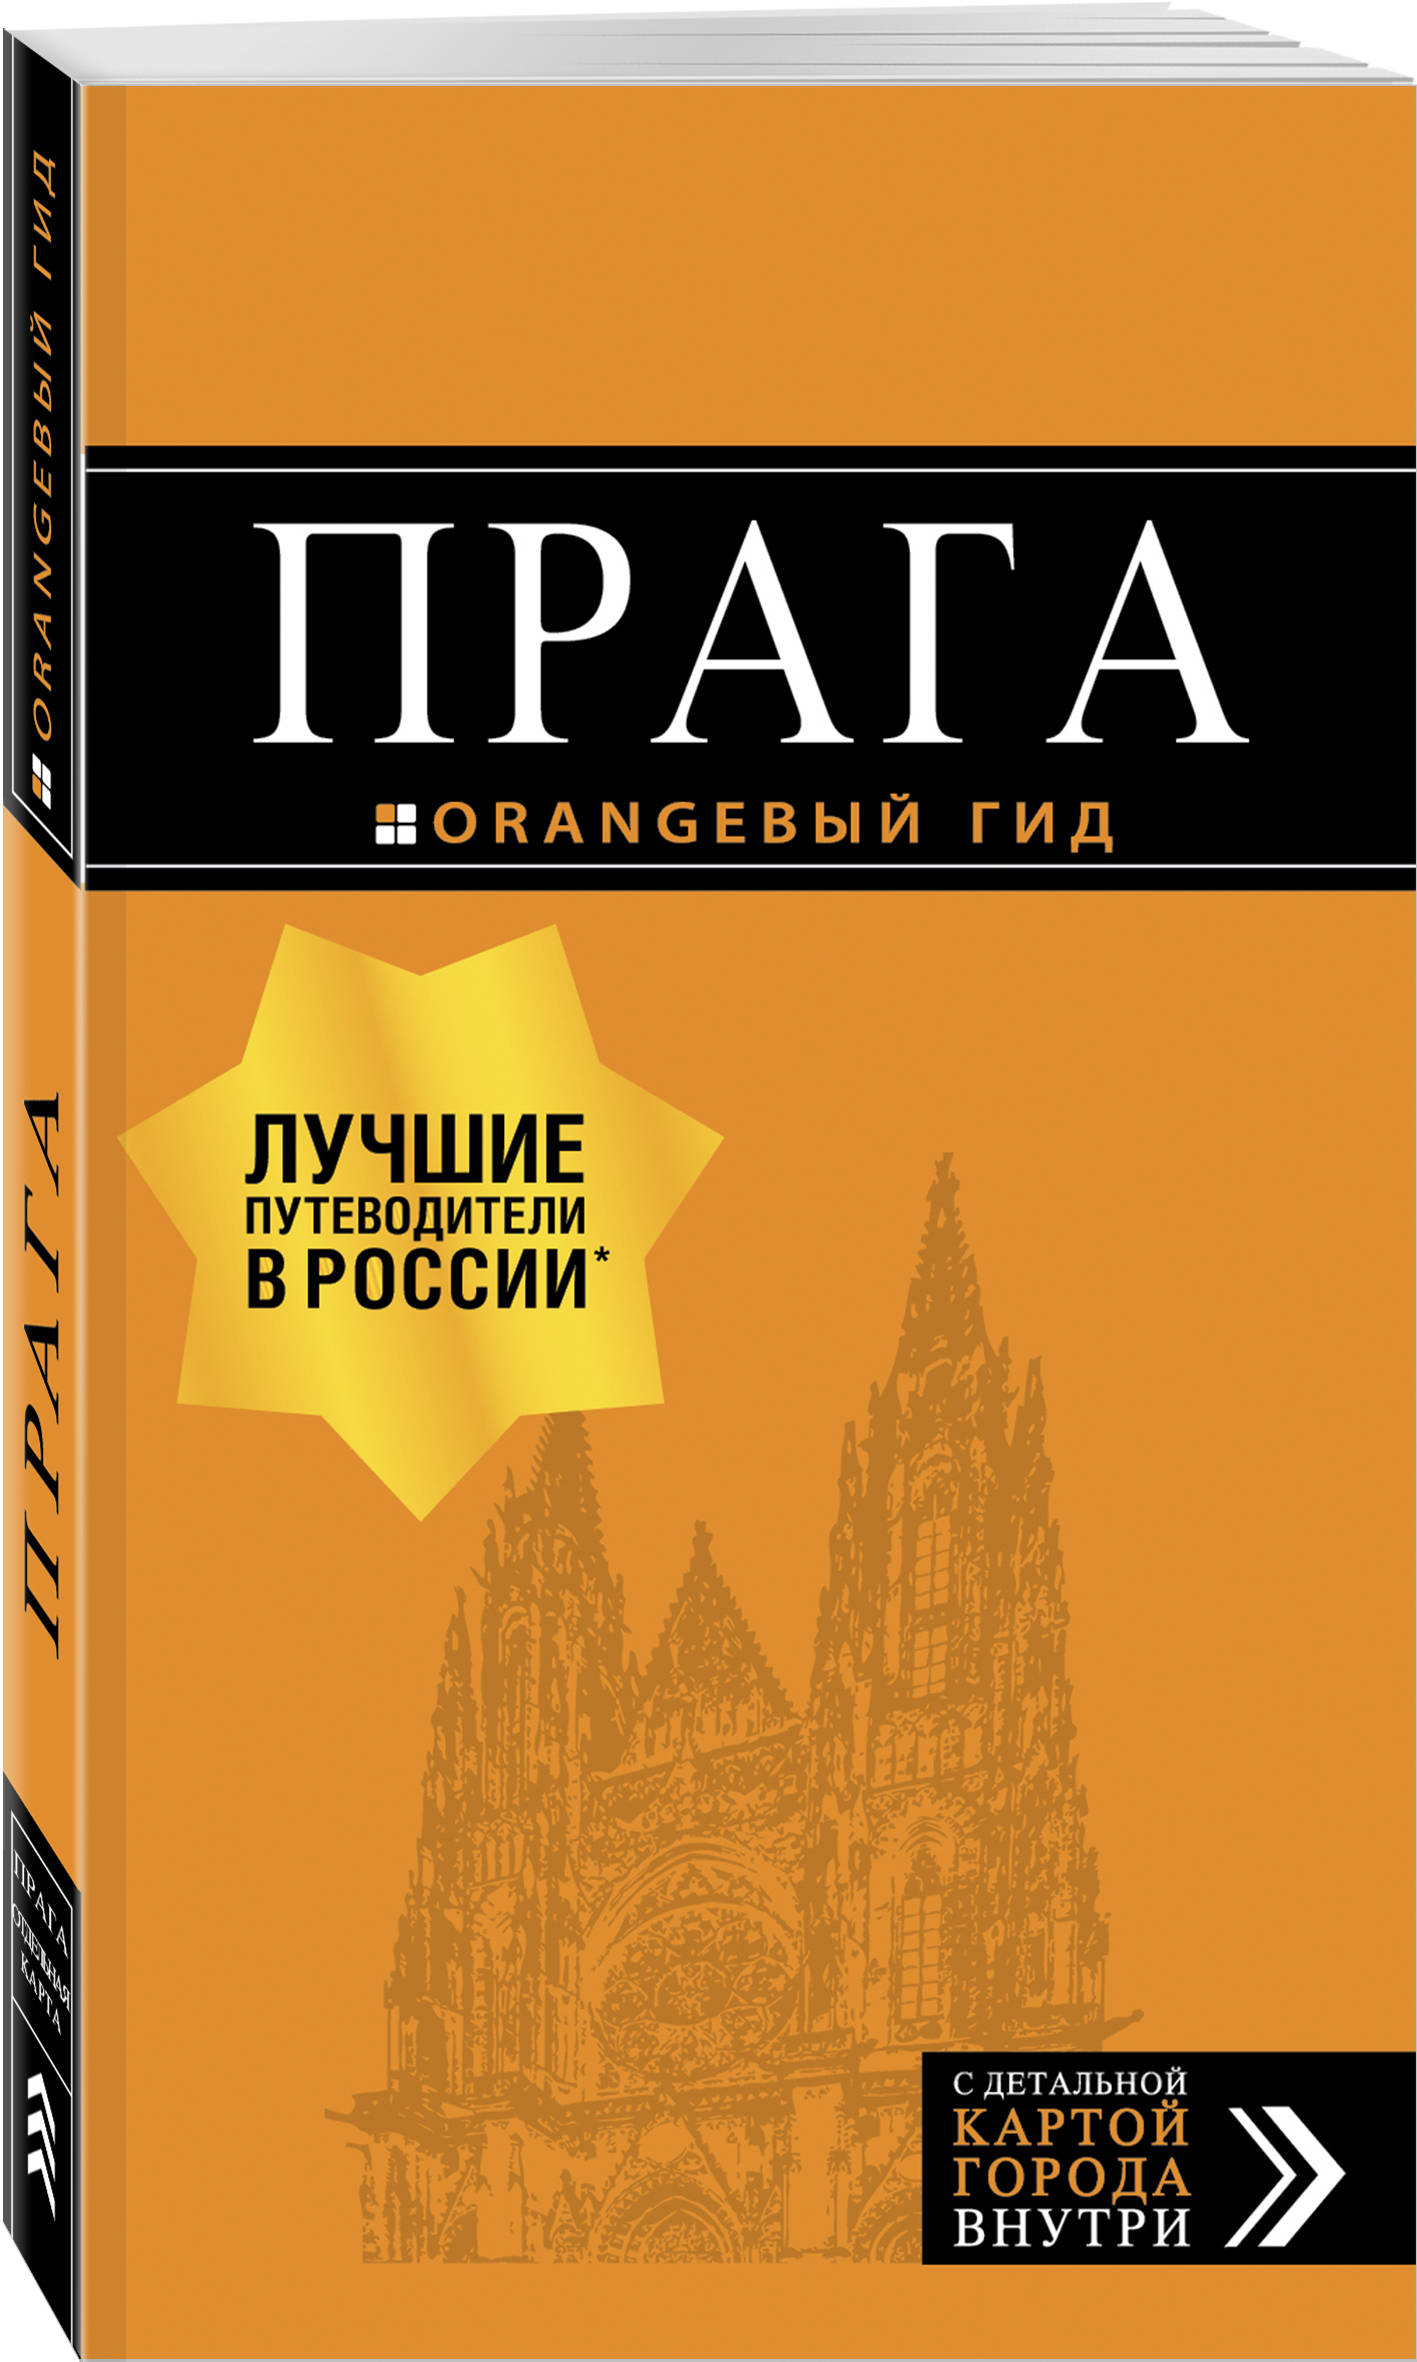 Т. Яровинская Прага: путеводитель + карта. 10-е изд., испр. и доп. прага москва самолет